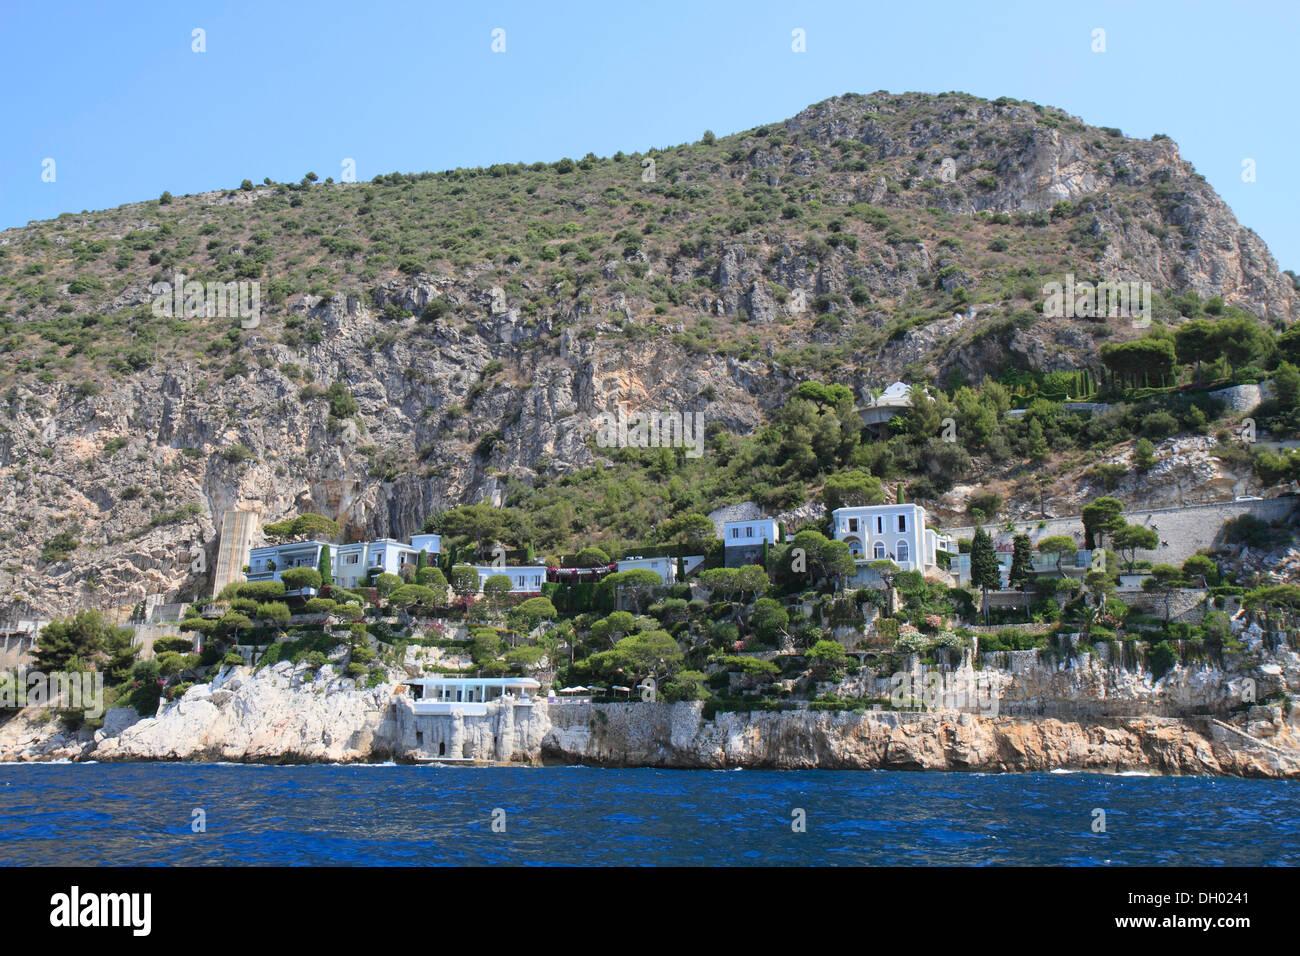 Beach villas at Eze Bord de Mer, Côte d'Azur, France, Mediterranean, Europe - Stock Image